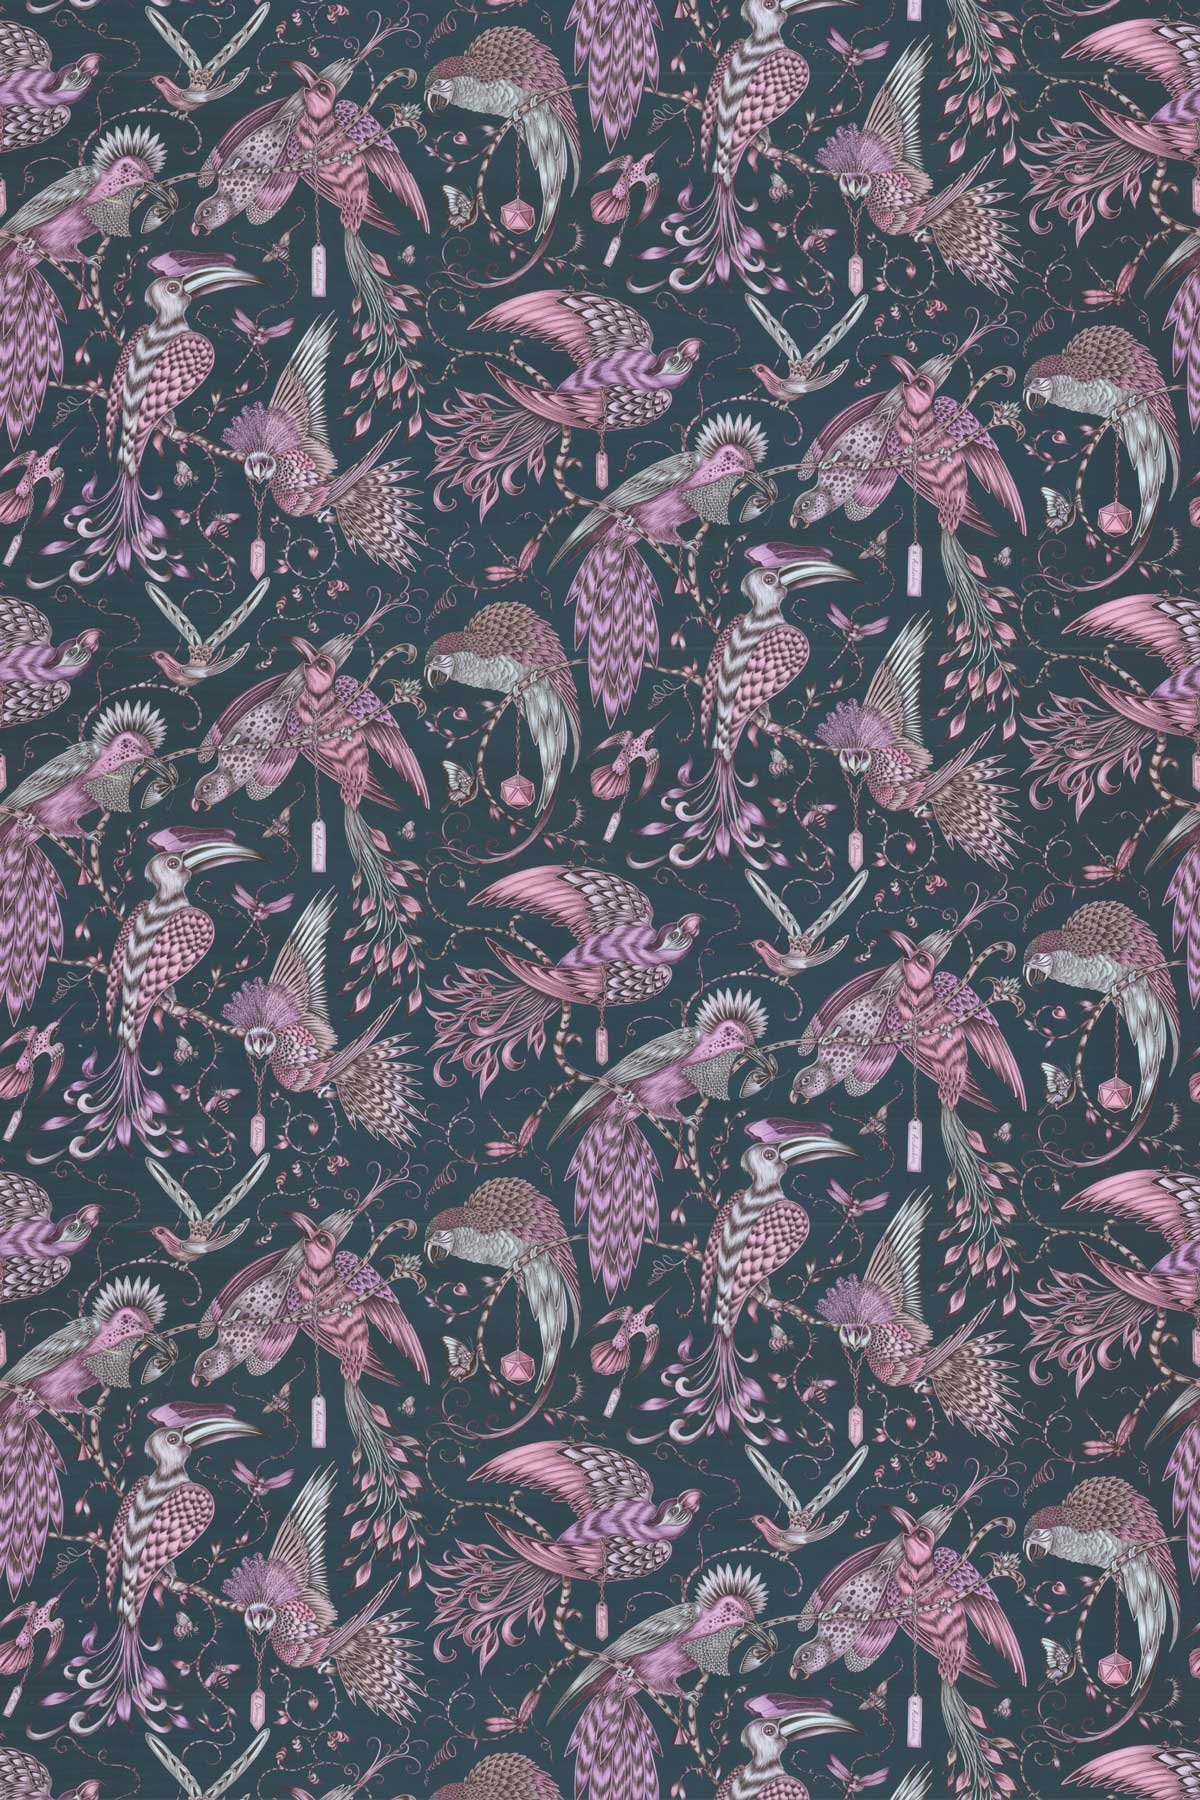 Emma J Shipley Audubon Pink Fabric - Product code: F1108/04